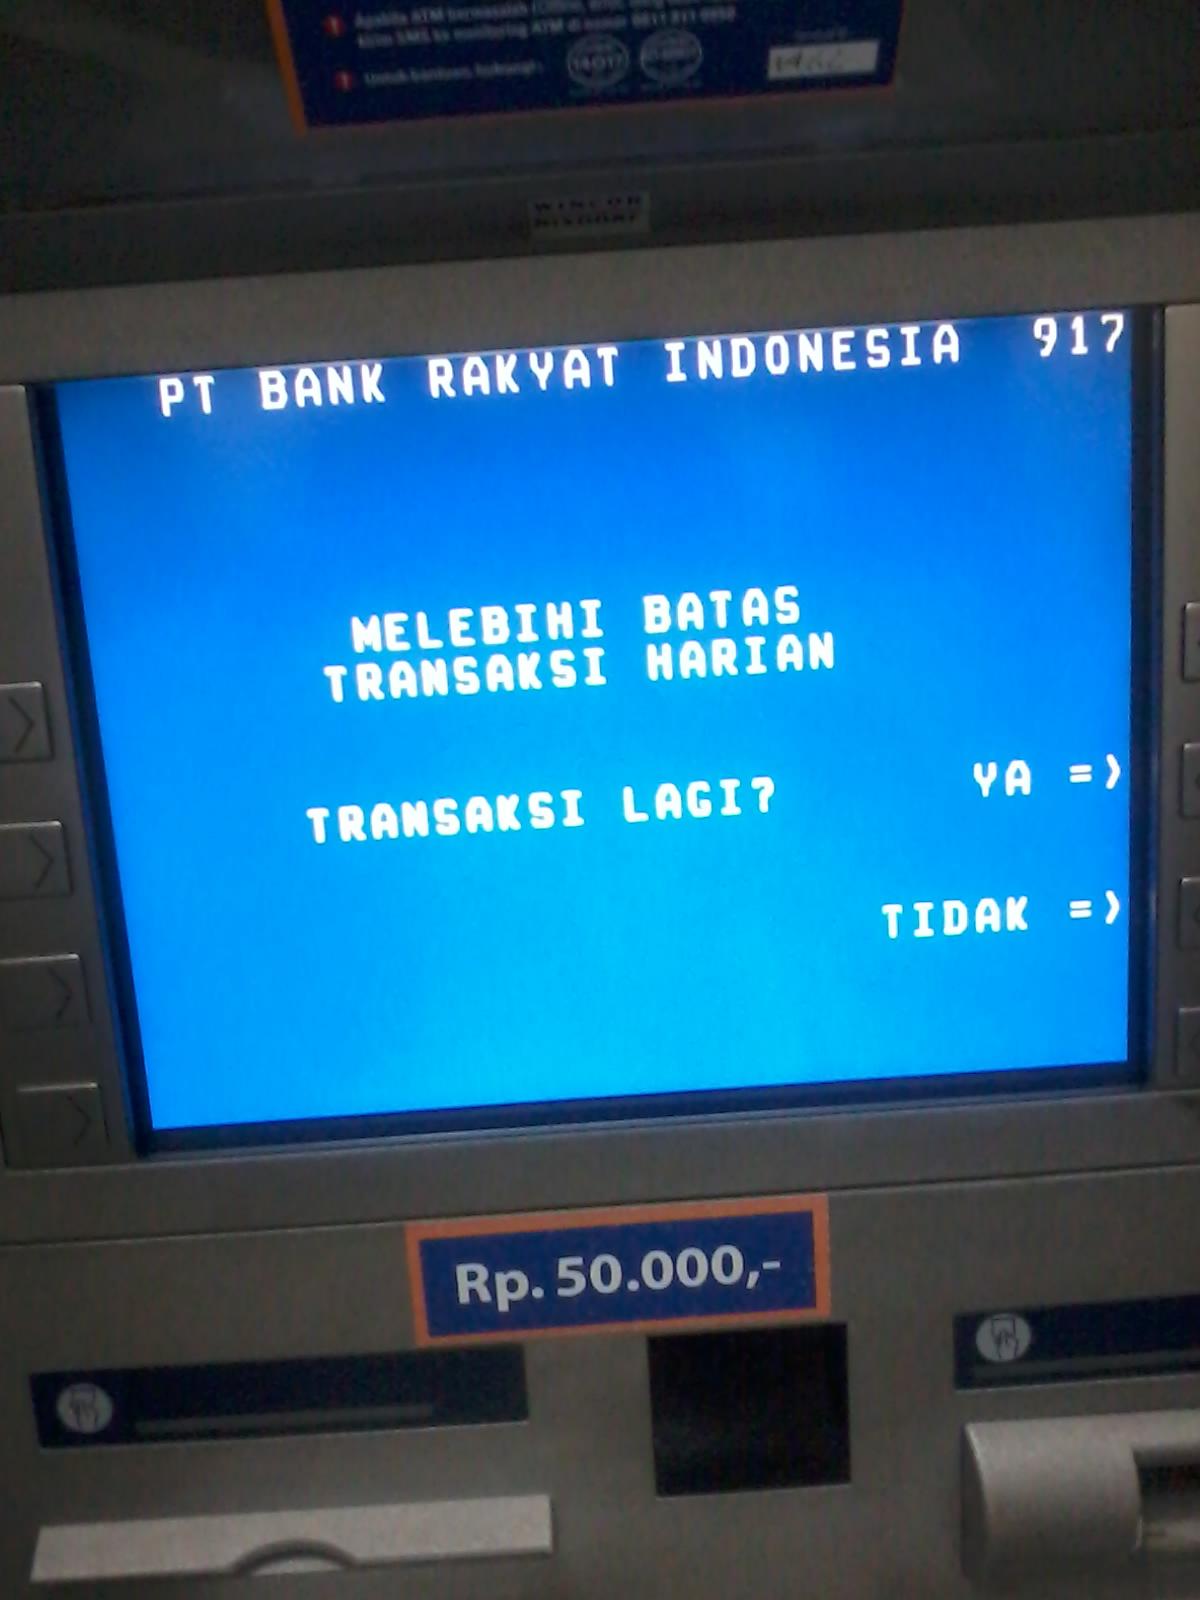 Batas Transaksi Harian Di Atm Adalah Rp 10 000 000 Blog Rivaekaputra Com